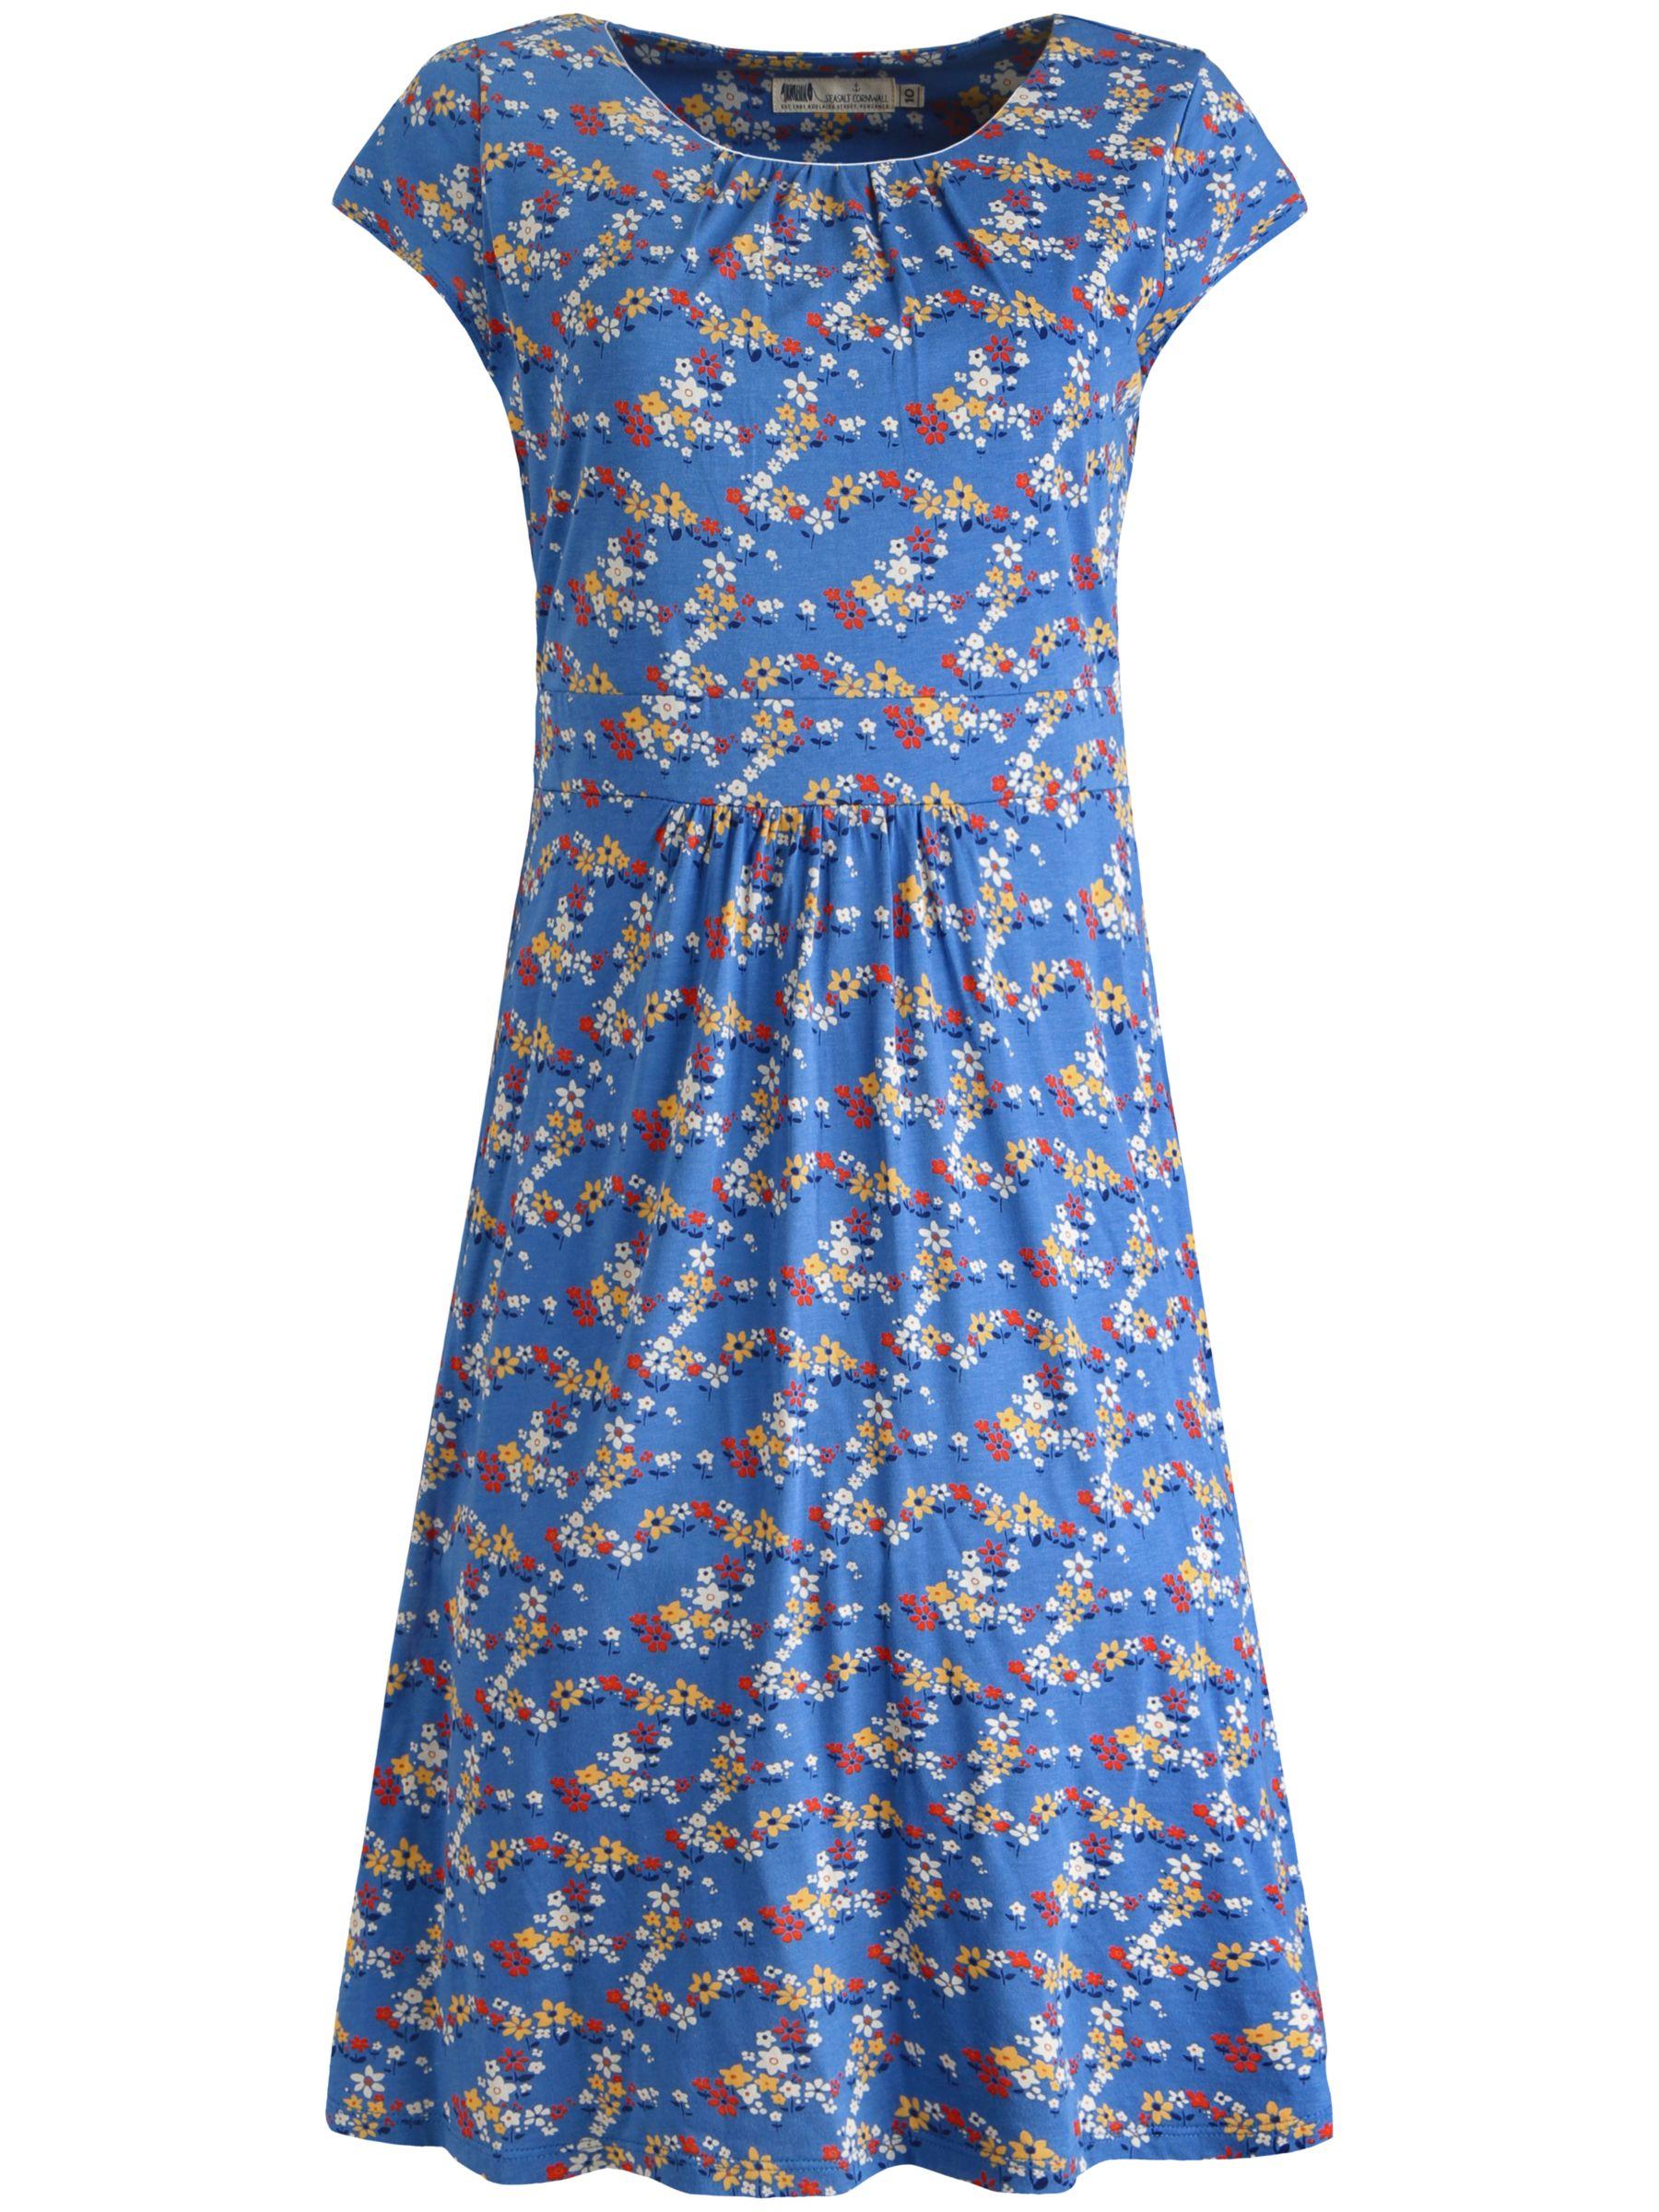 seasalt carnmoggas field flowers dress cornish blue, seasalt, carnmoggas, field, flowers, dress, cornish, blue, 14|16|12|10|8, women, womens dresses, 1927283